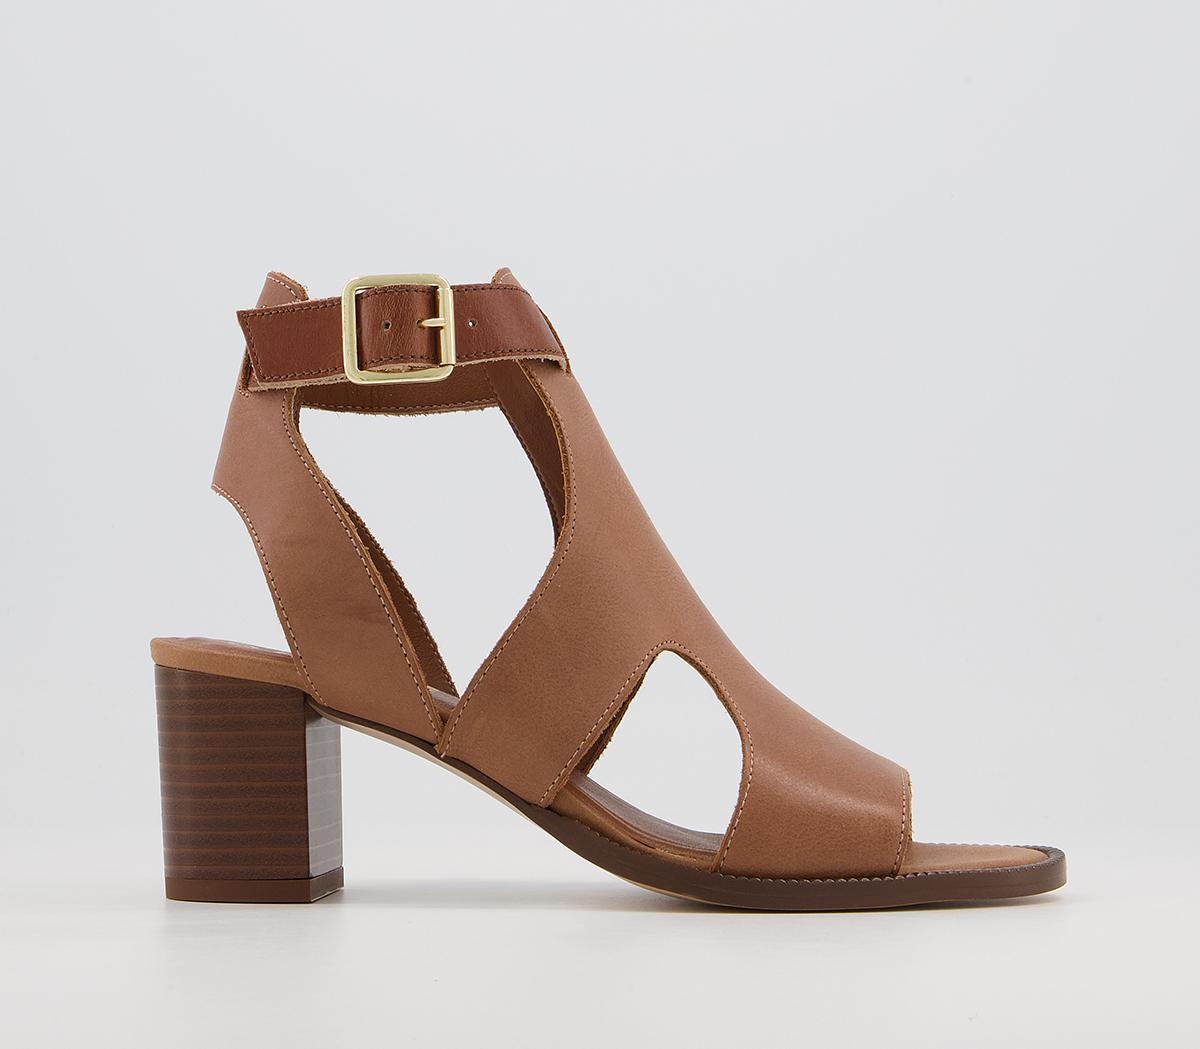 Middelburg Covered Sandals